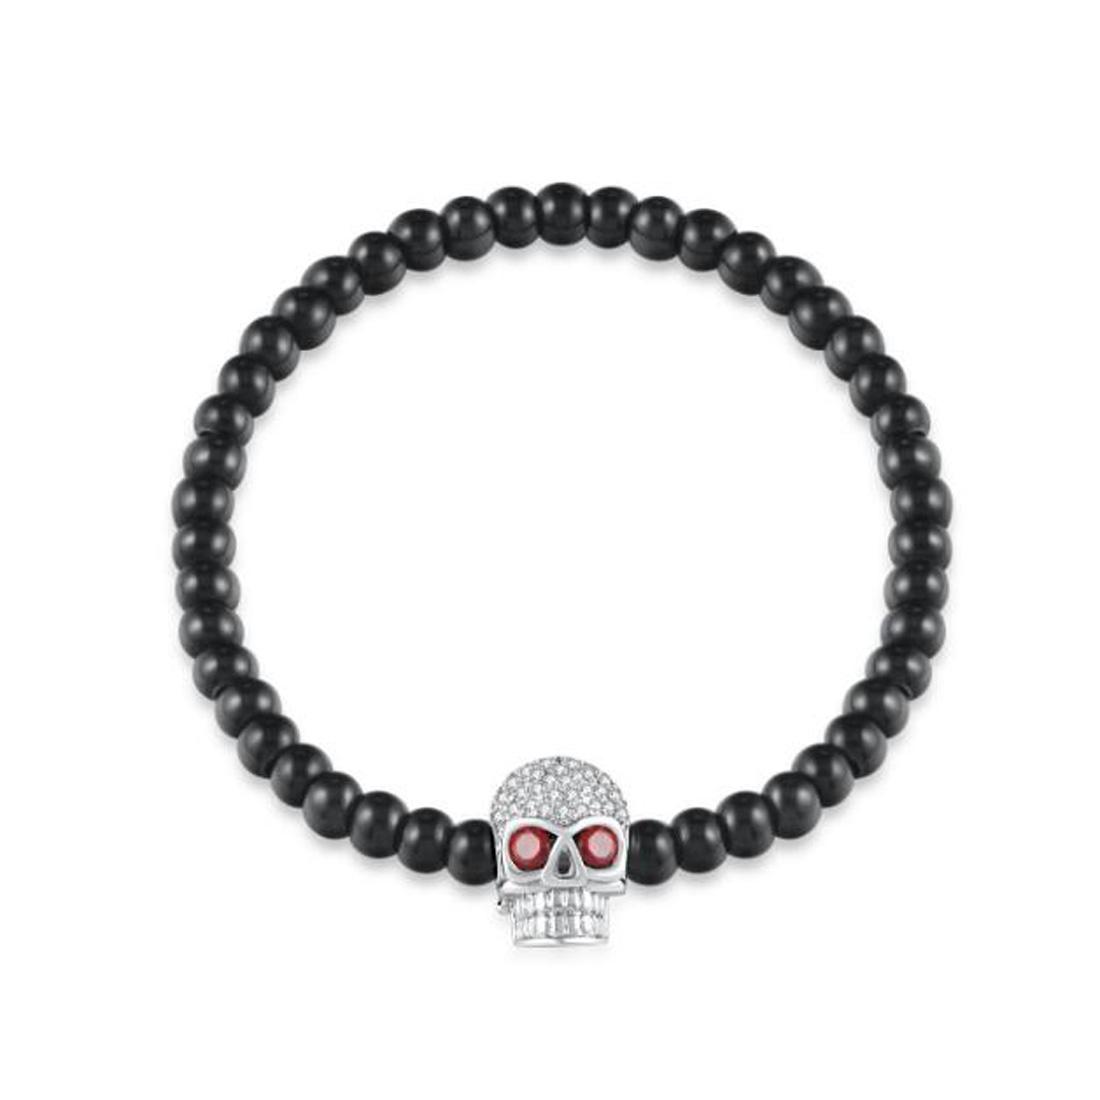 6pcs Music Charm Tibetan Silver Bead Finding Jewellery Making 32x11mm